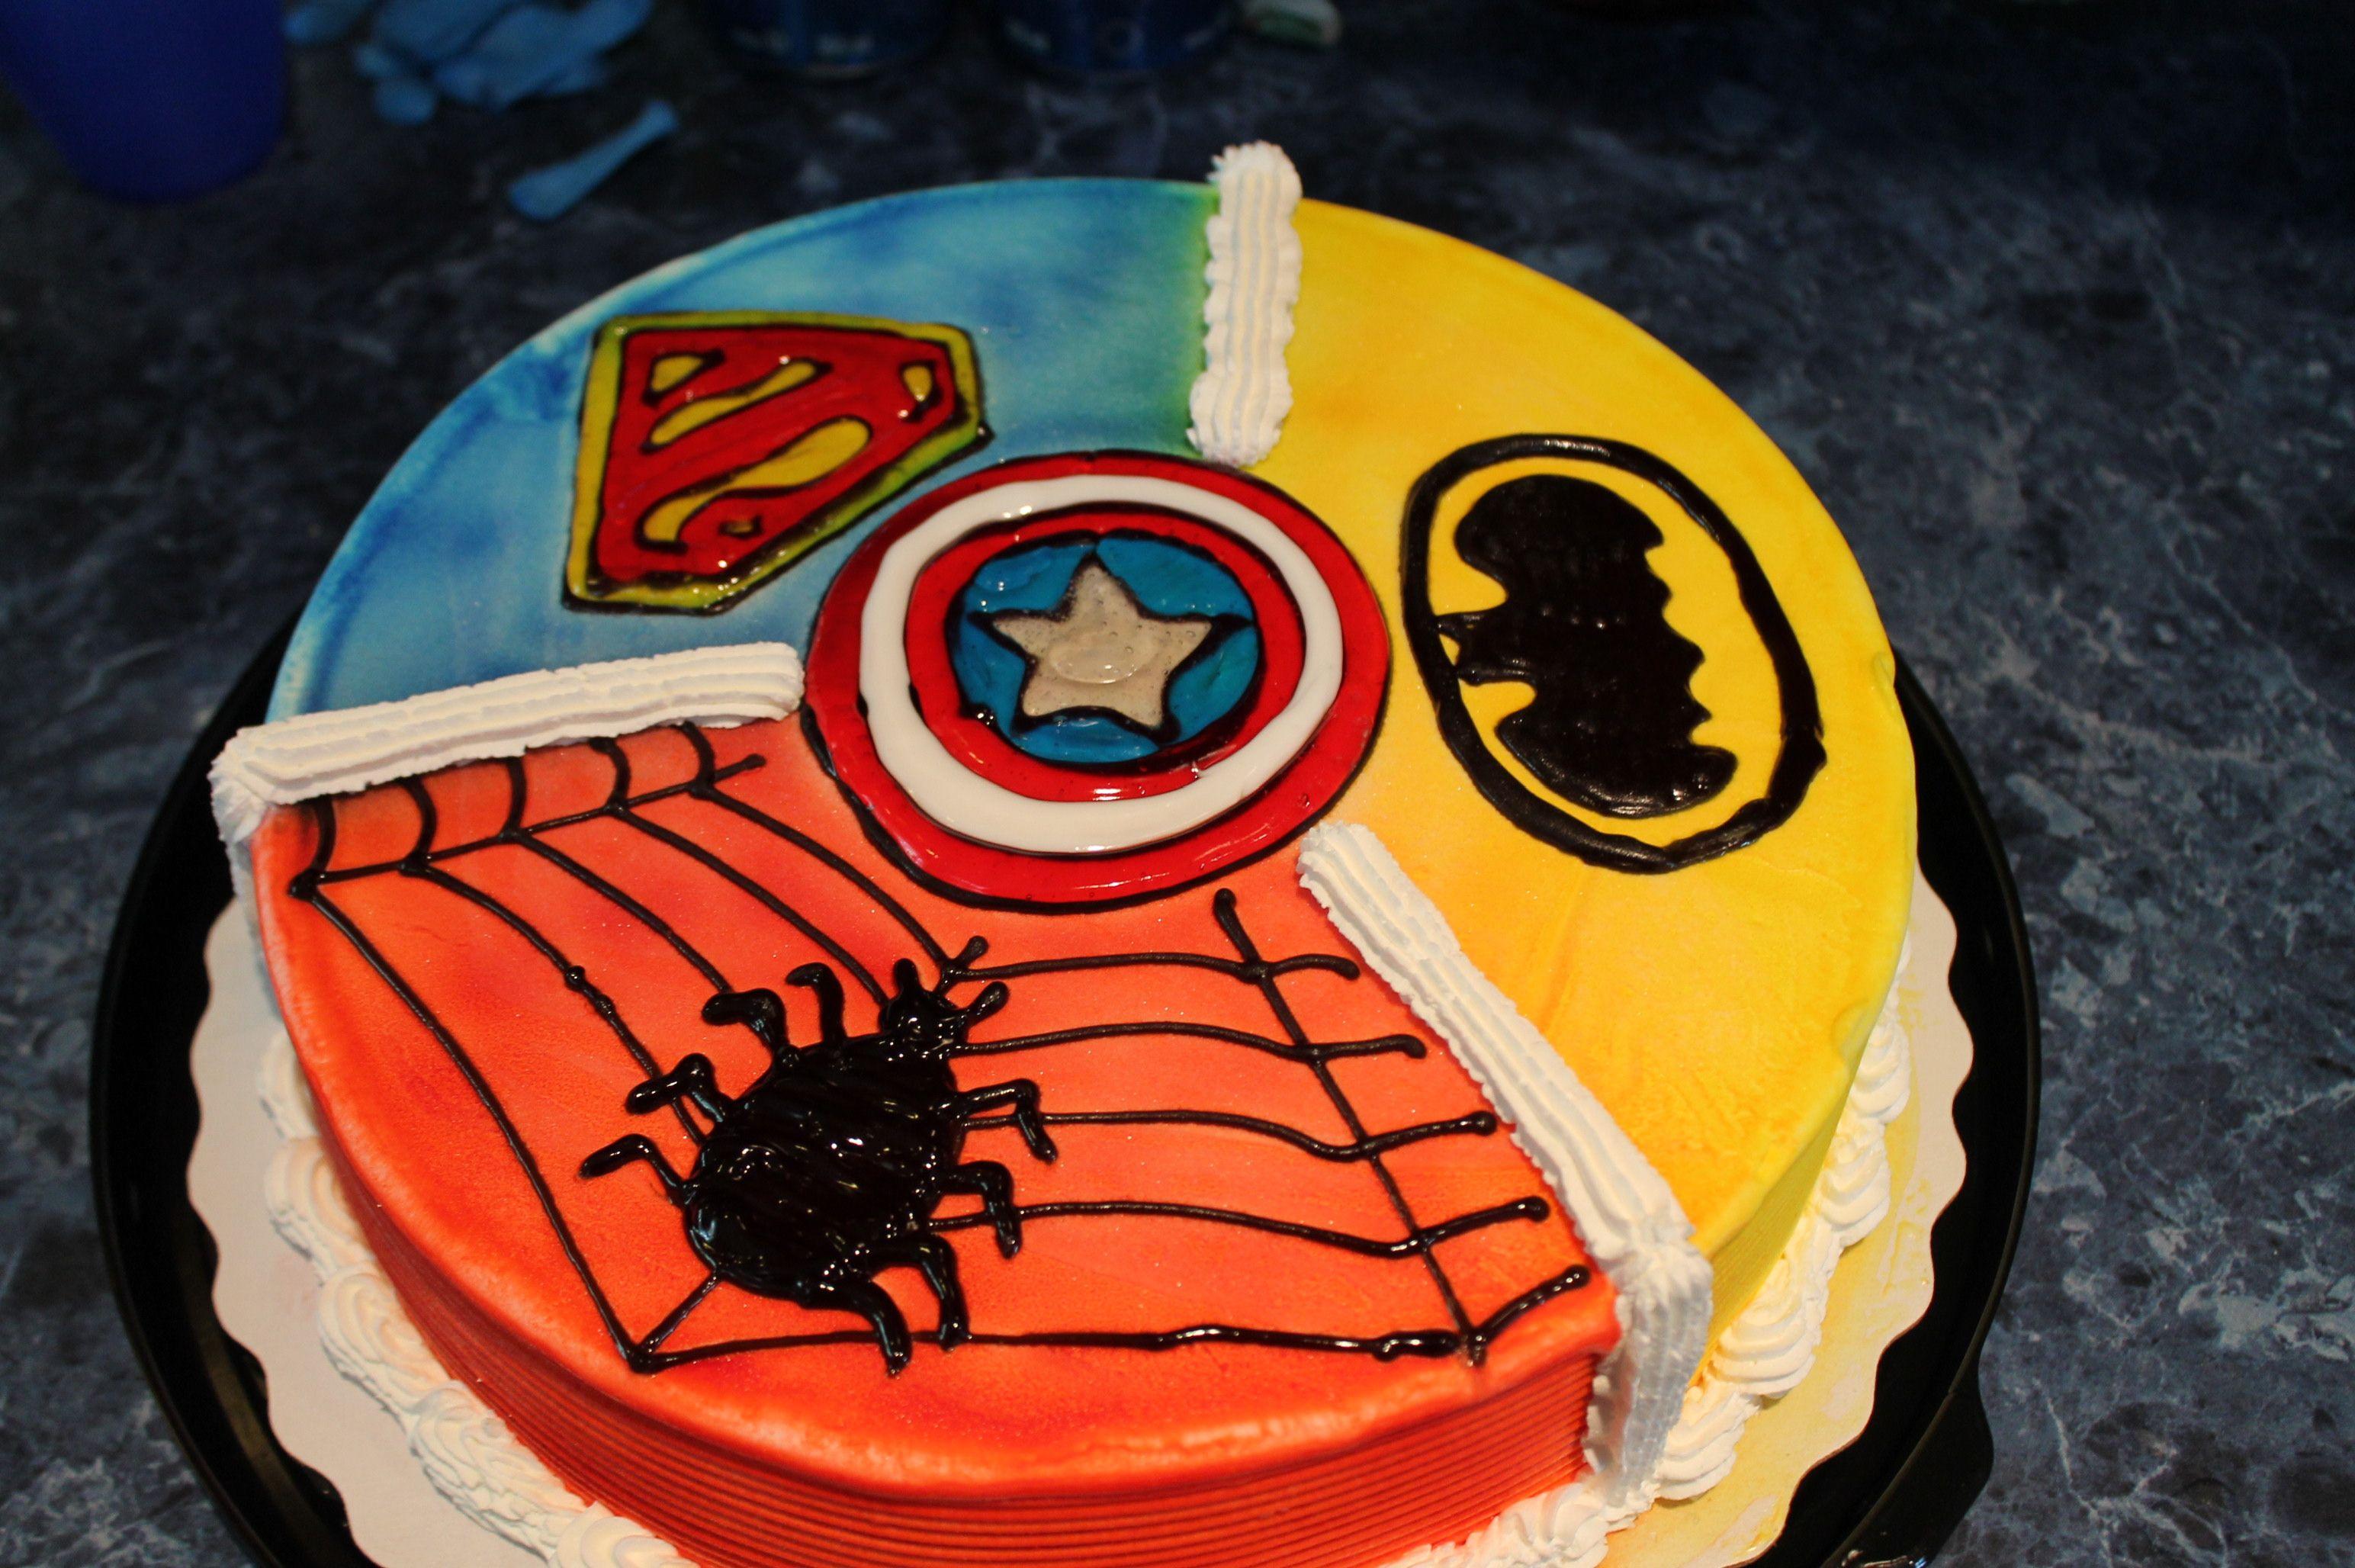 Superhero Party Dq Ice Cream Cake Ice Cream Cake Pinterest